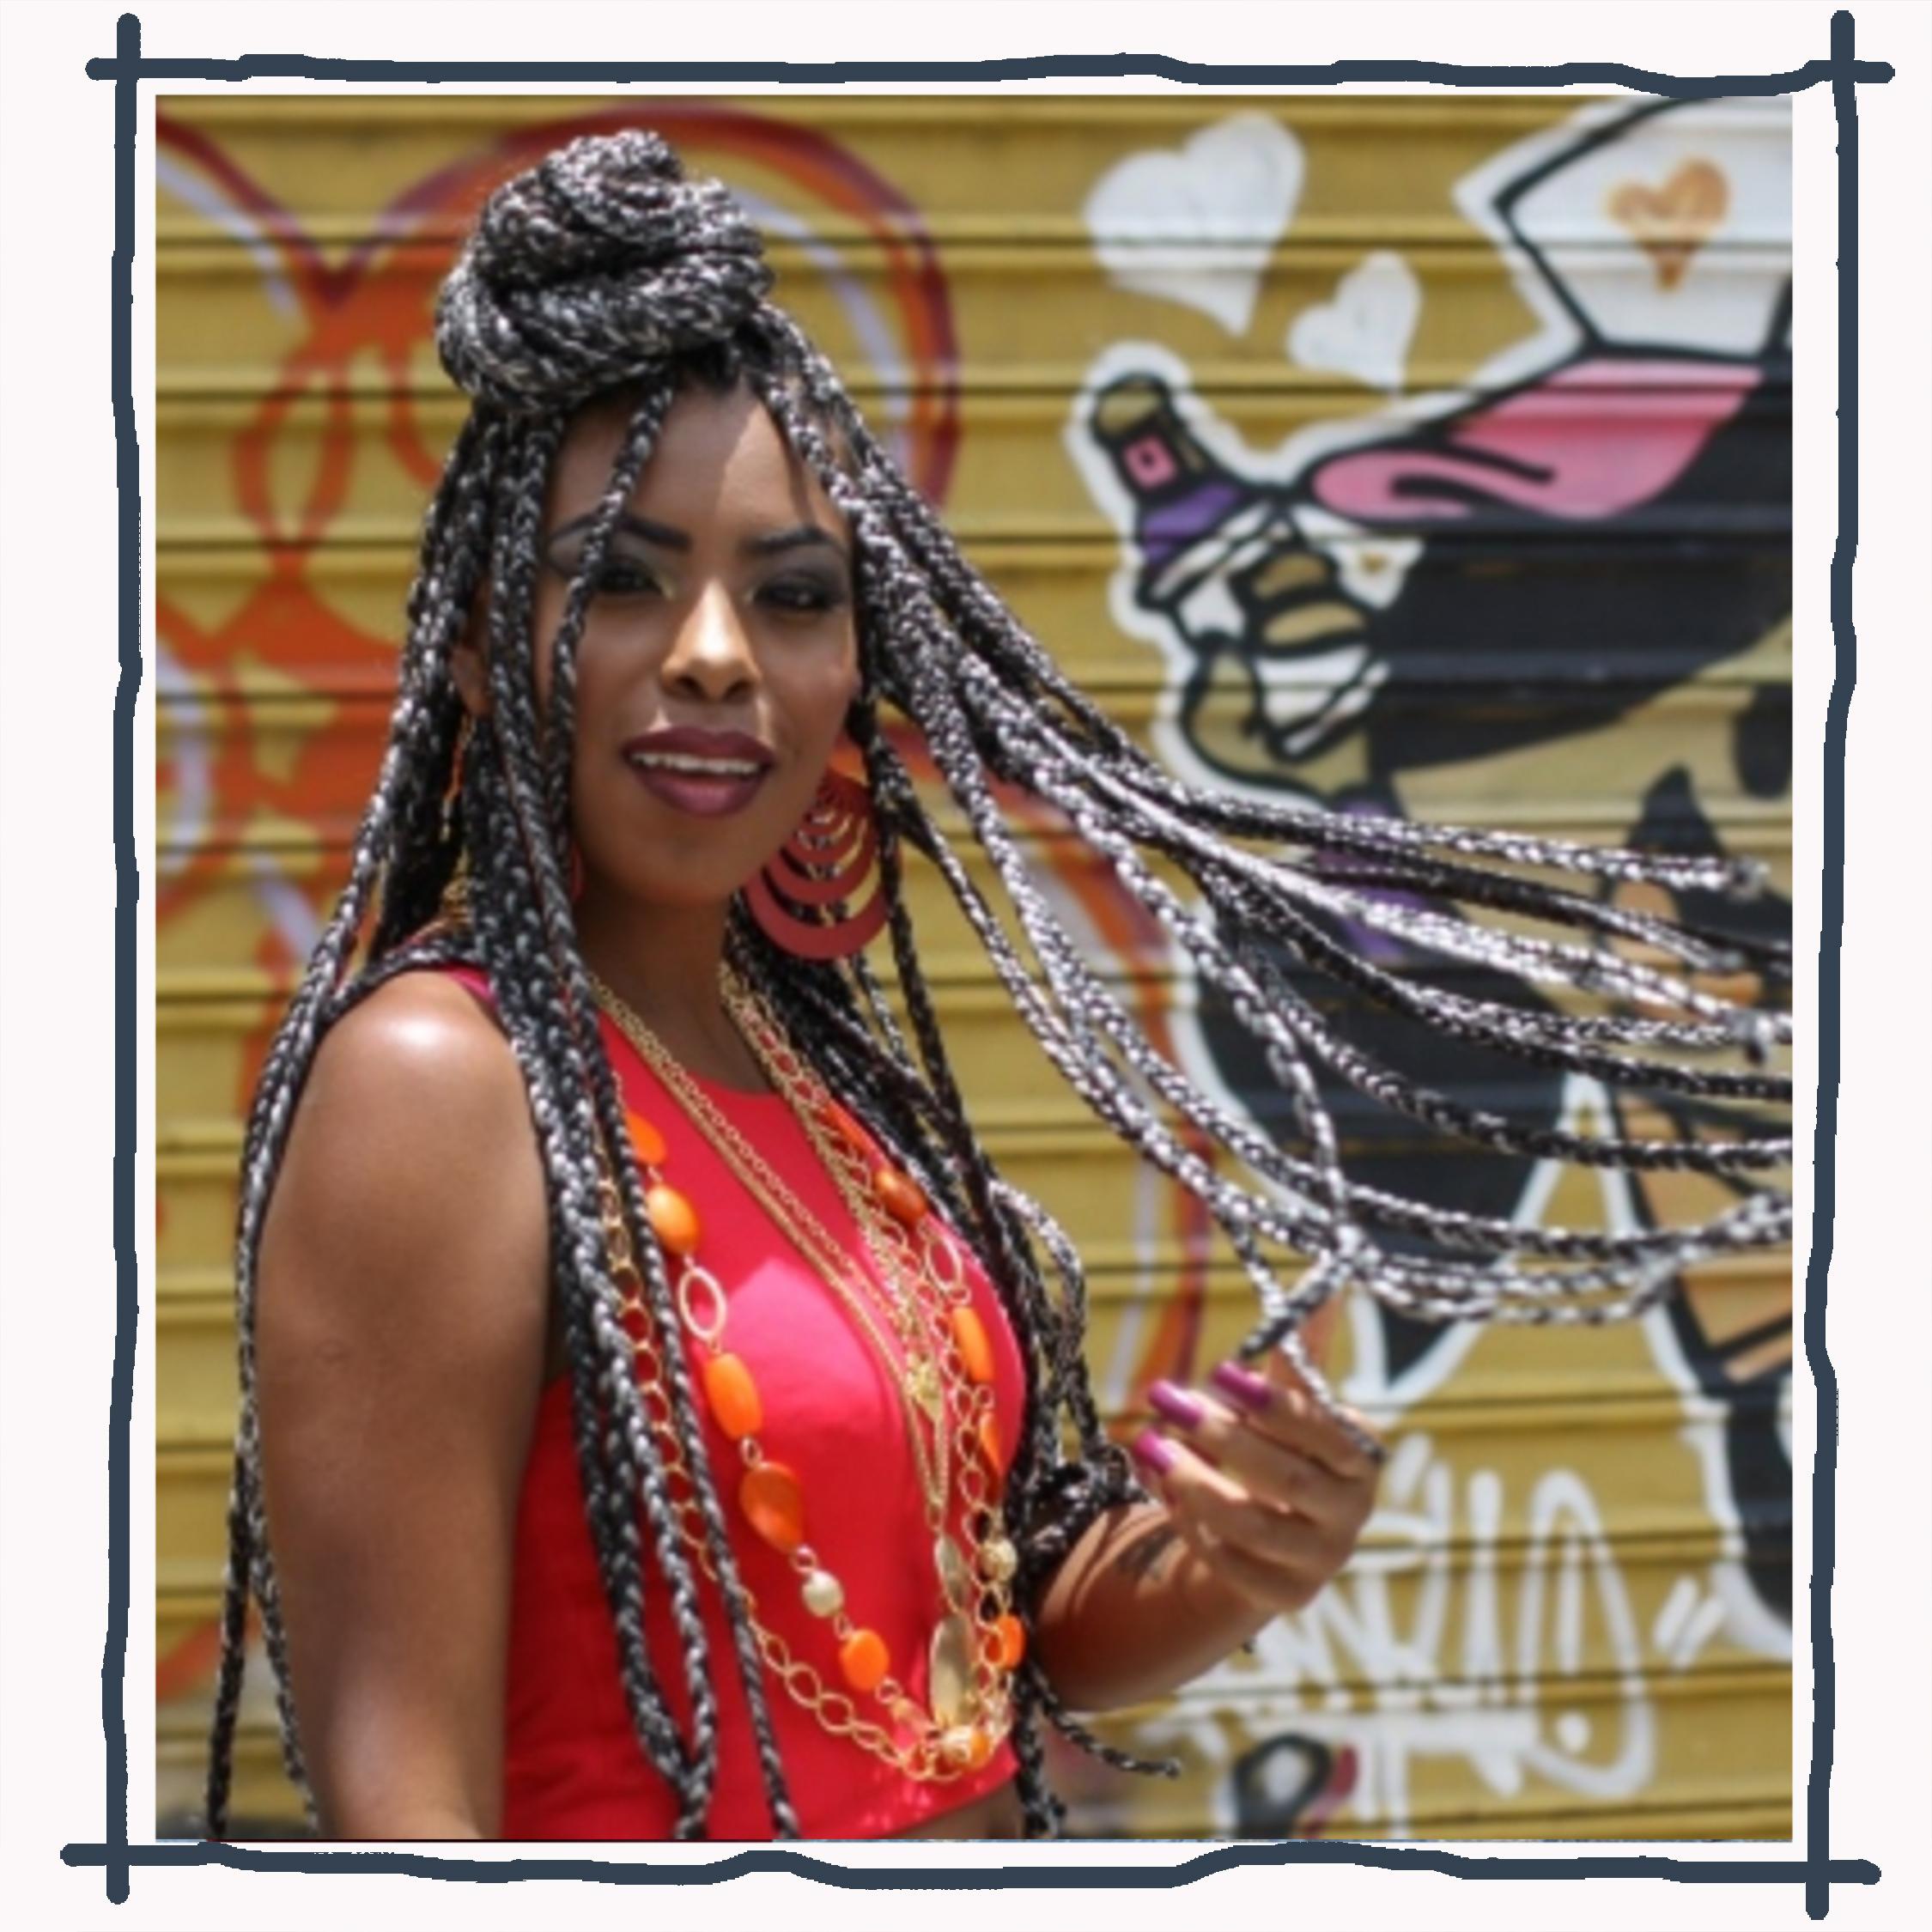 One of Brazil's Funkeiras, the name for female MCs of Funk Carioca music  Image:  Hoje Emdia